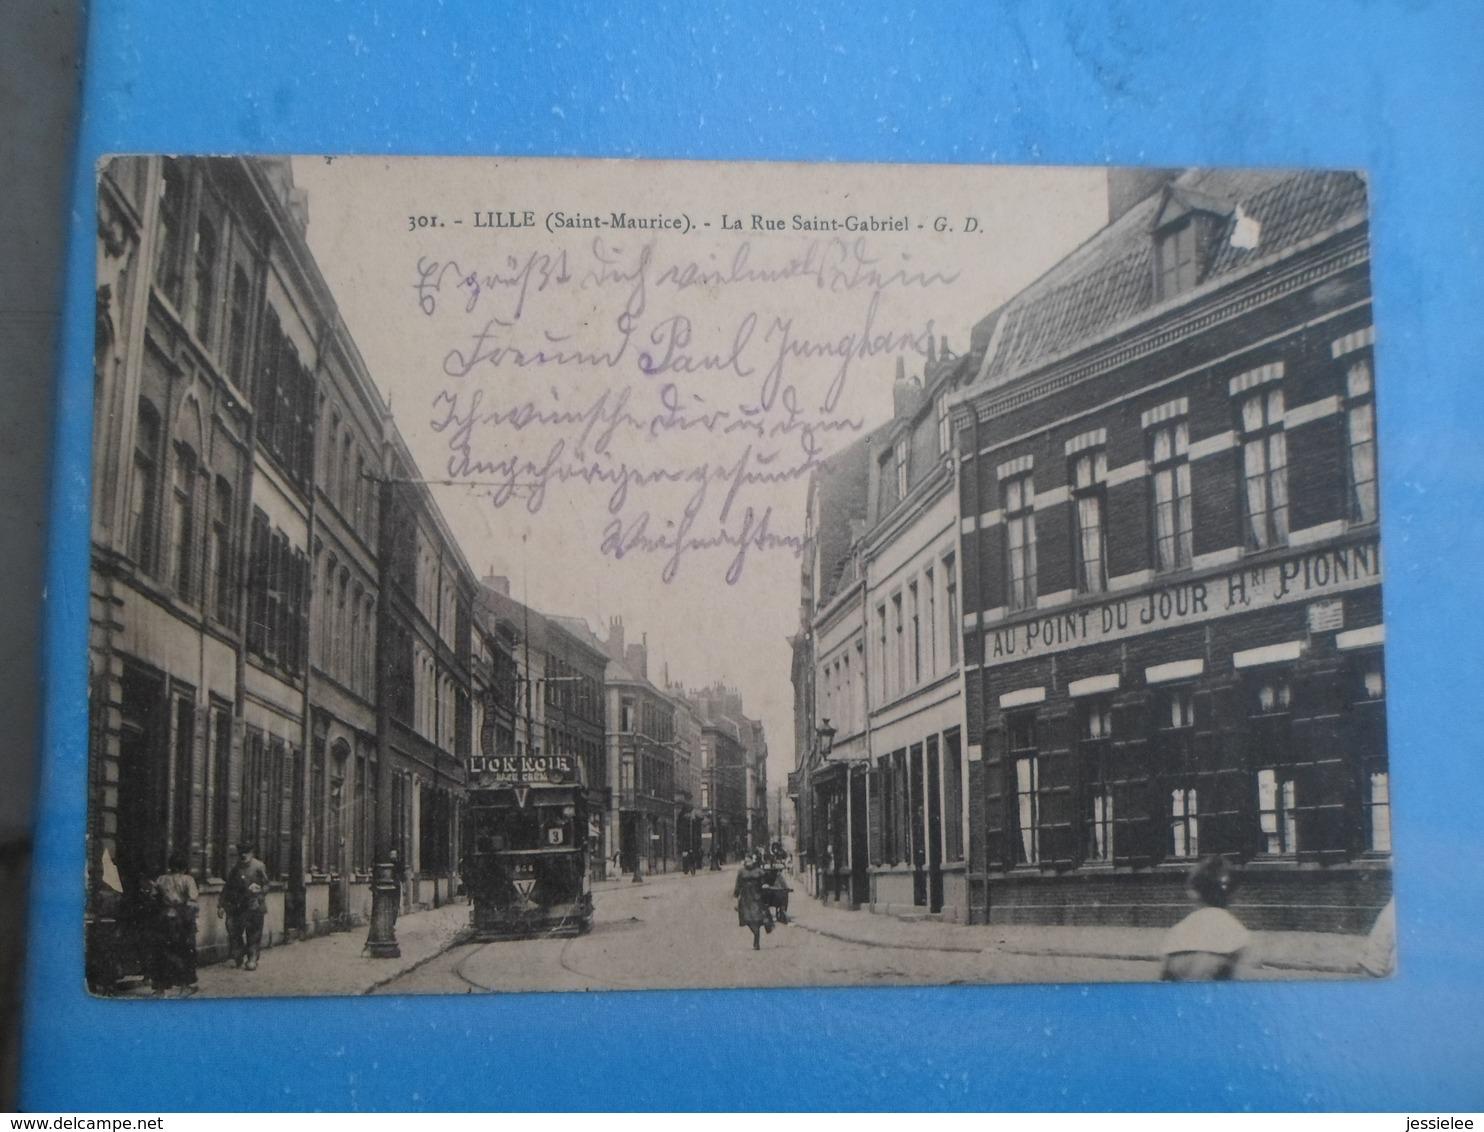 Carte Postale Lille Saint Maurice, La Rue Saint Gabriel, Tramway, Commerce - Tramways